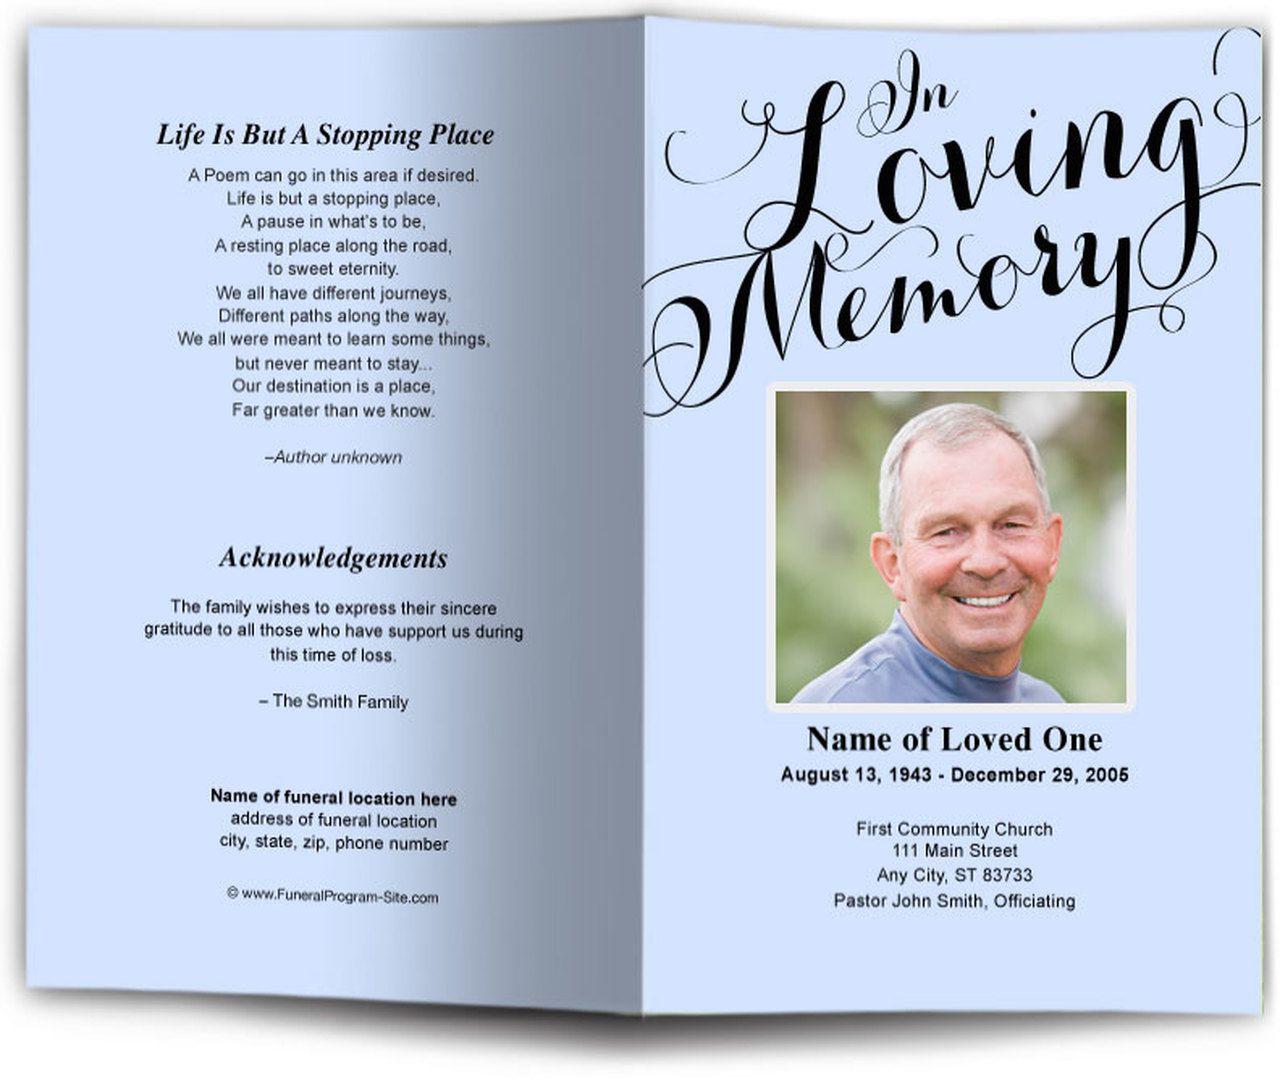 008 Breathtaking In Loving Memory Template Image  Free Download Card BookmarkFull